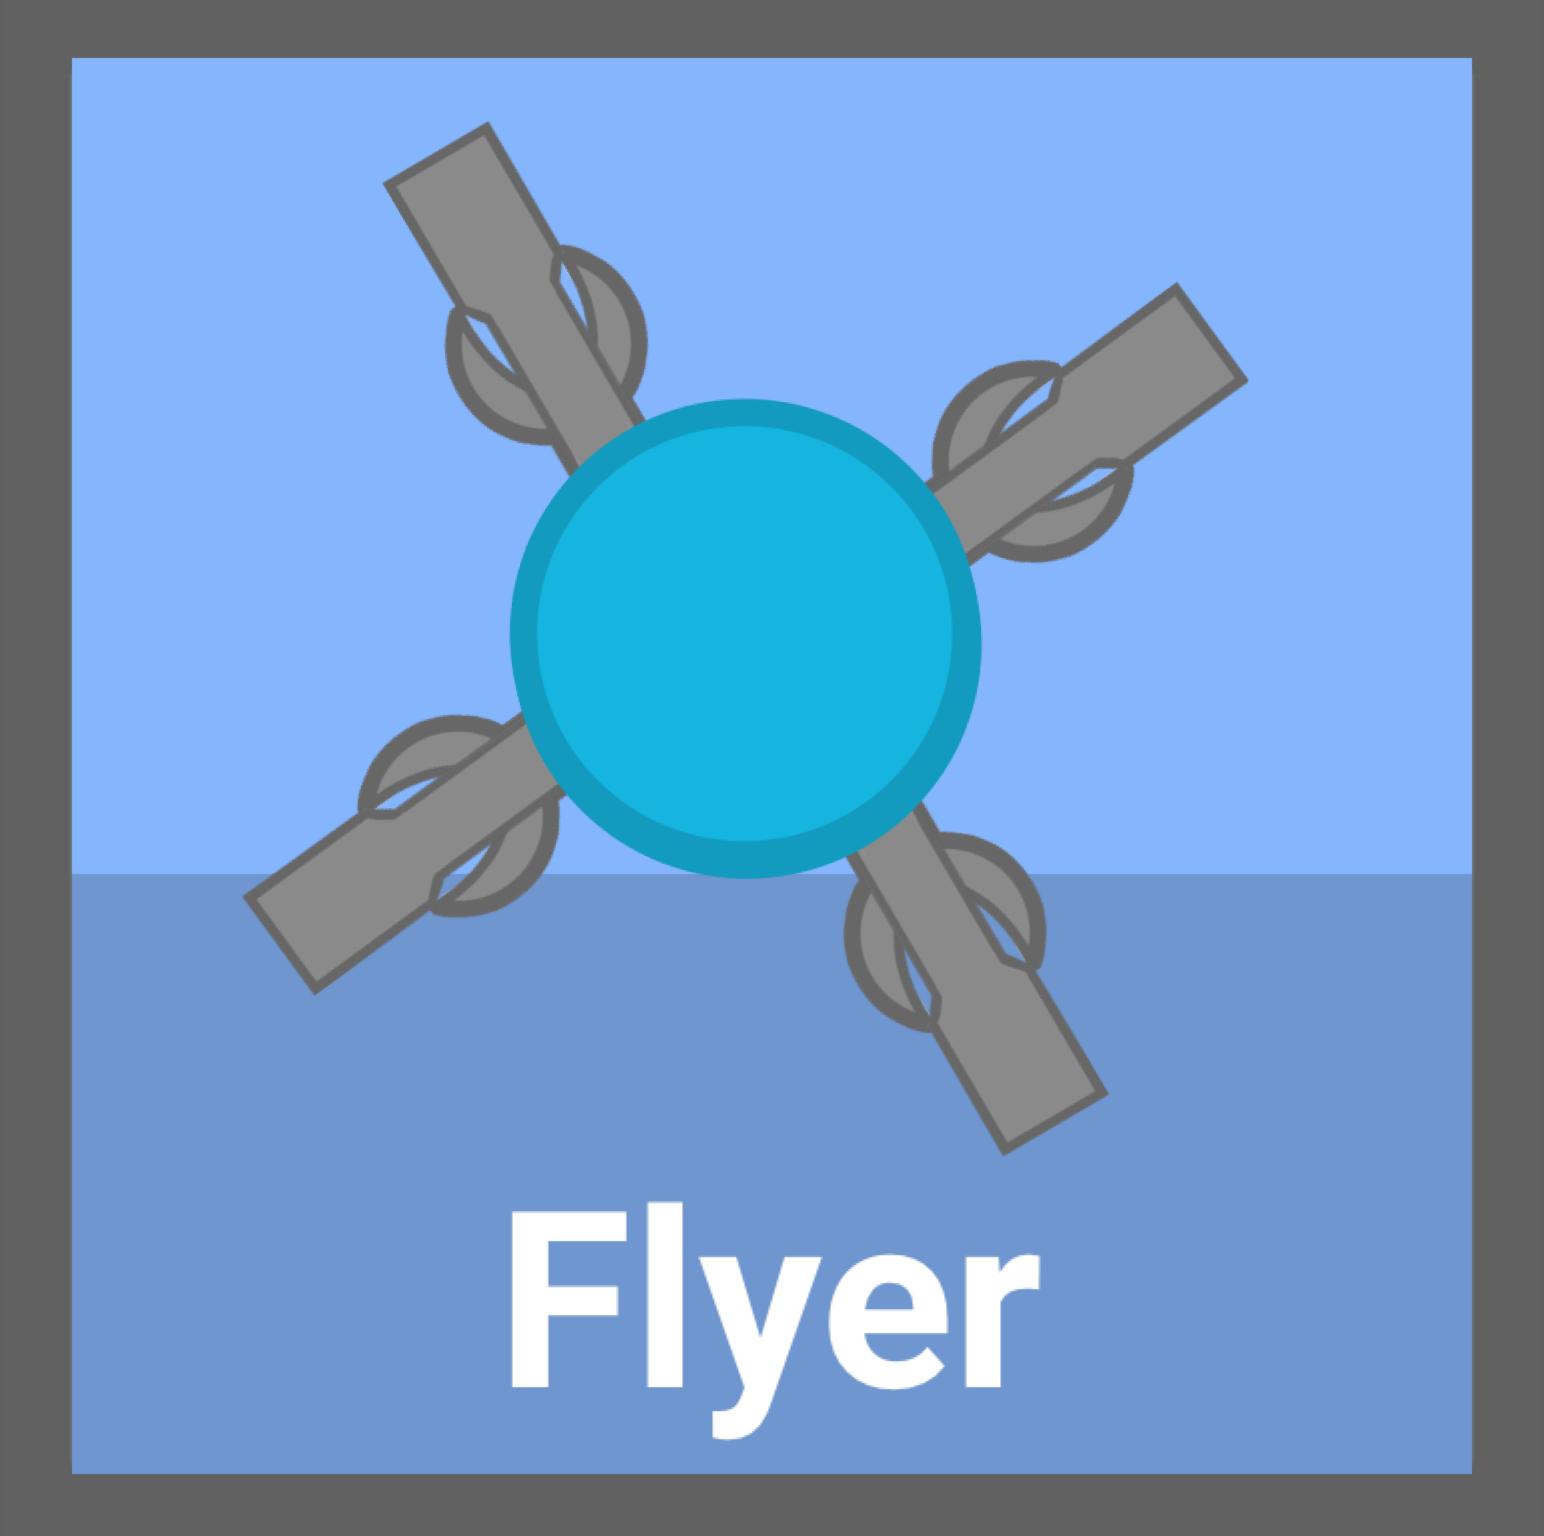 Flyer (MickxGold)